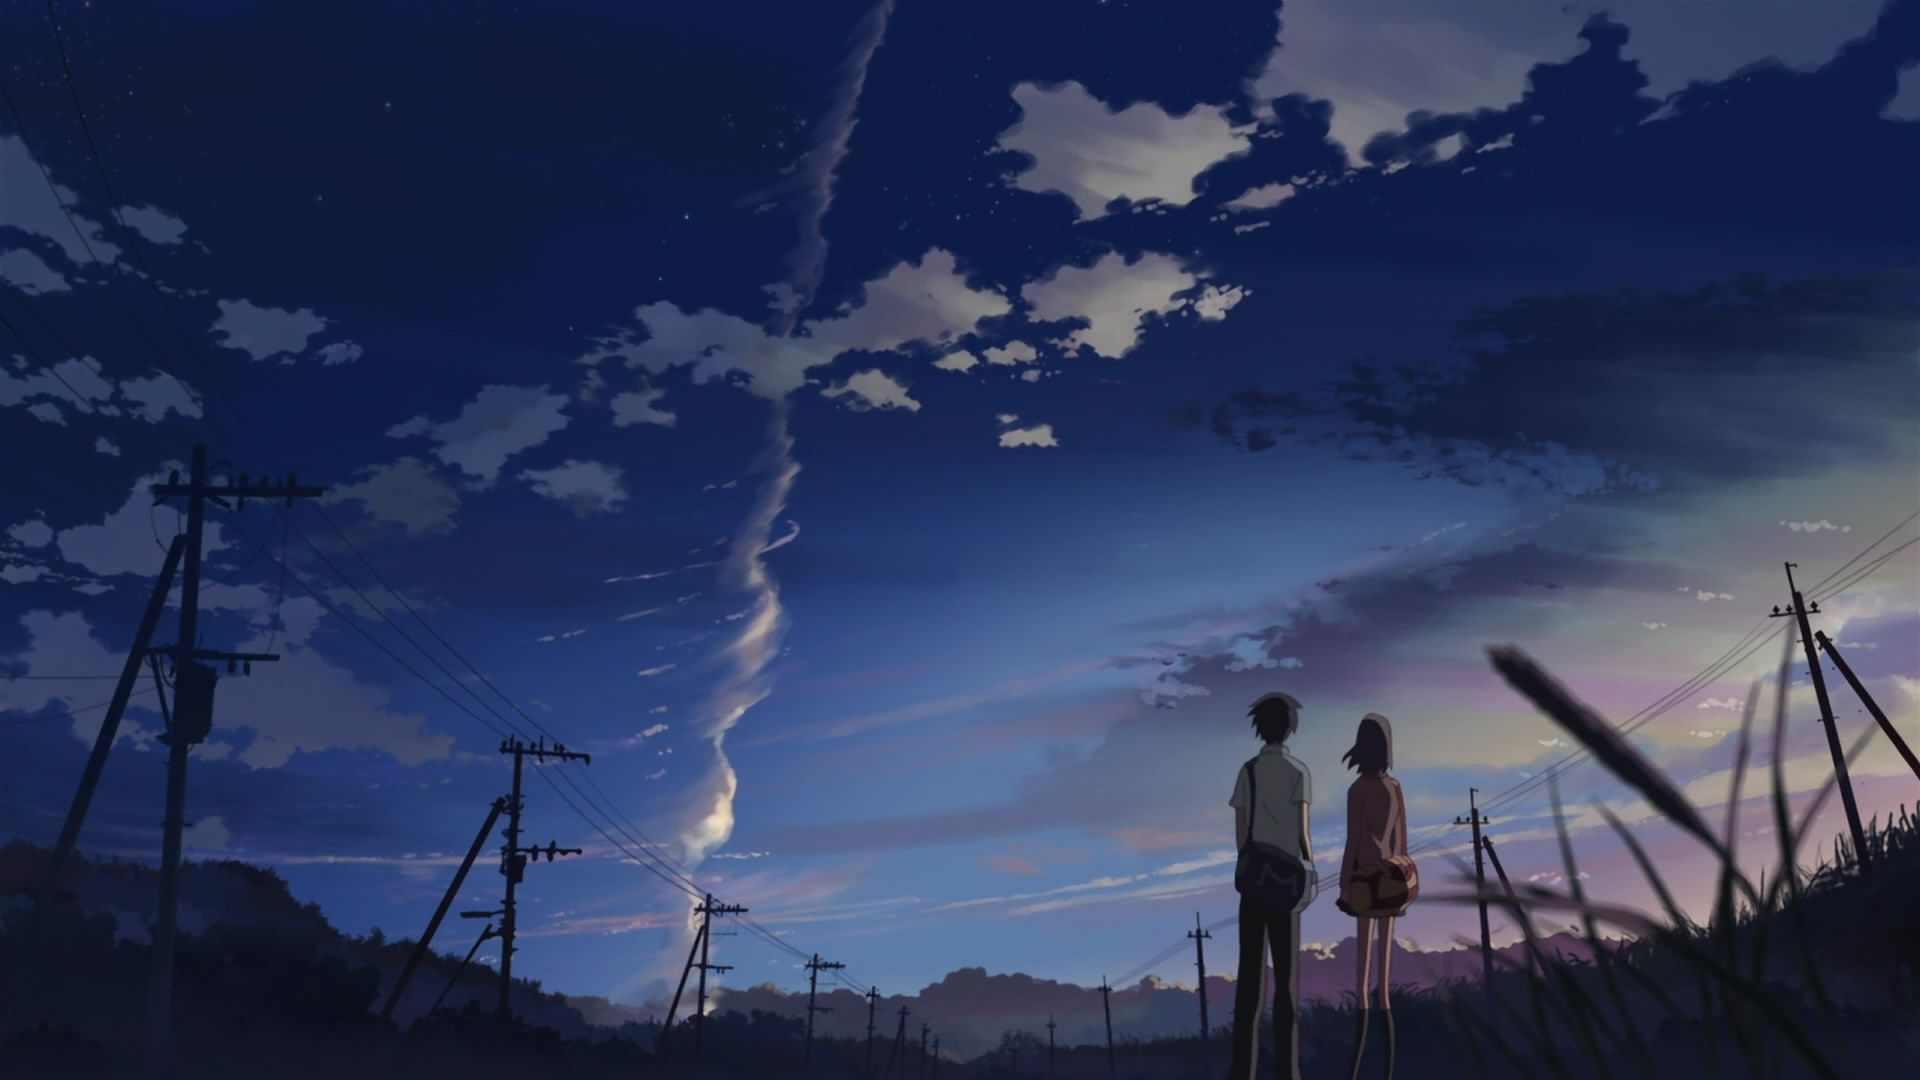 More Discrete Anime Wallpapers Anime Scenery Anime Scenery Wallpaper Anime Background Anime scenery wallpaper gif